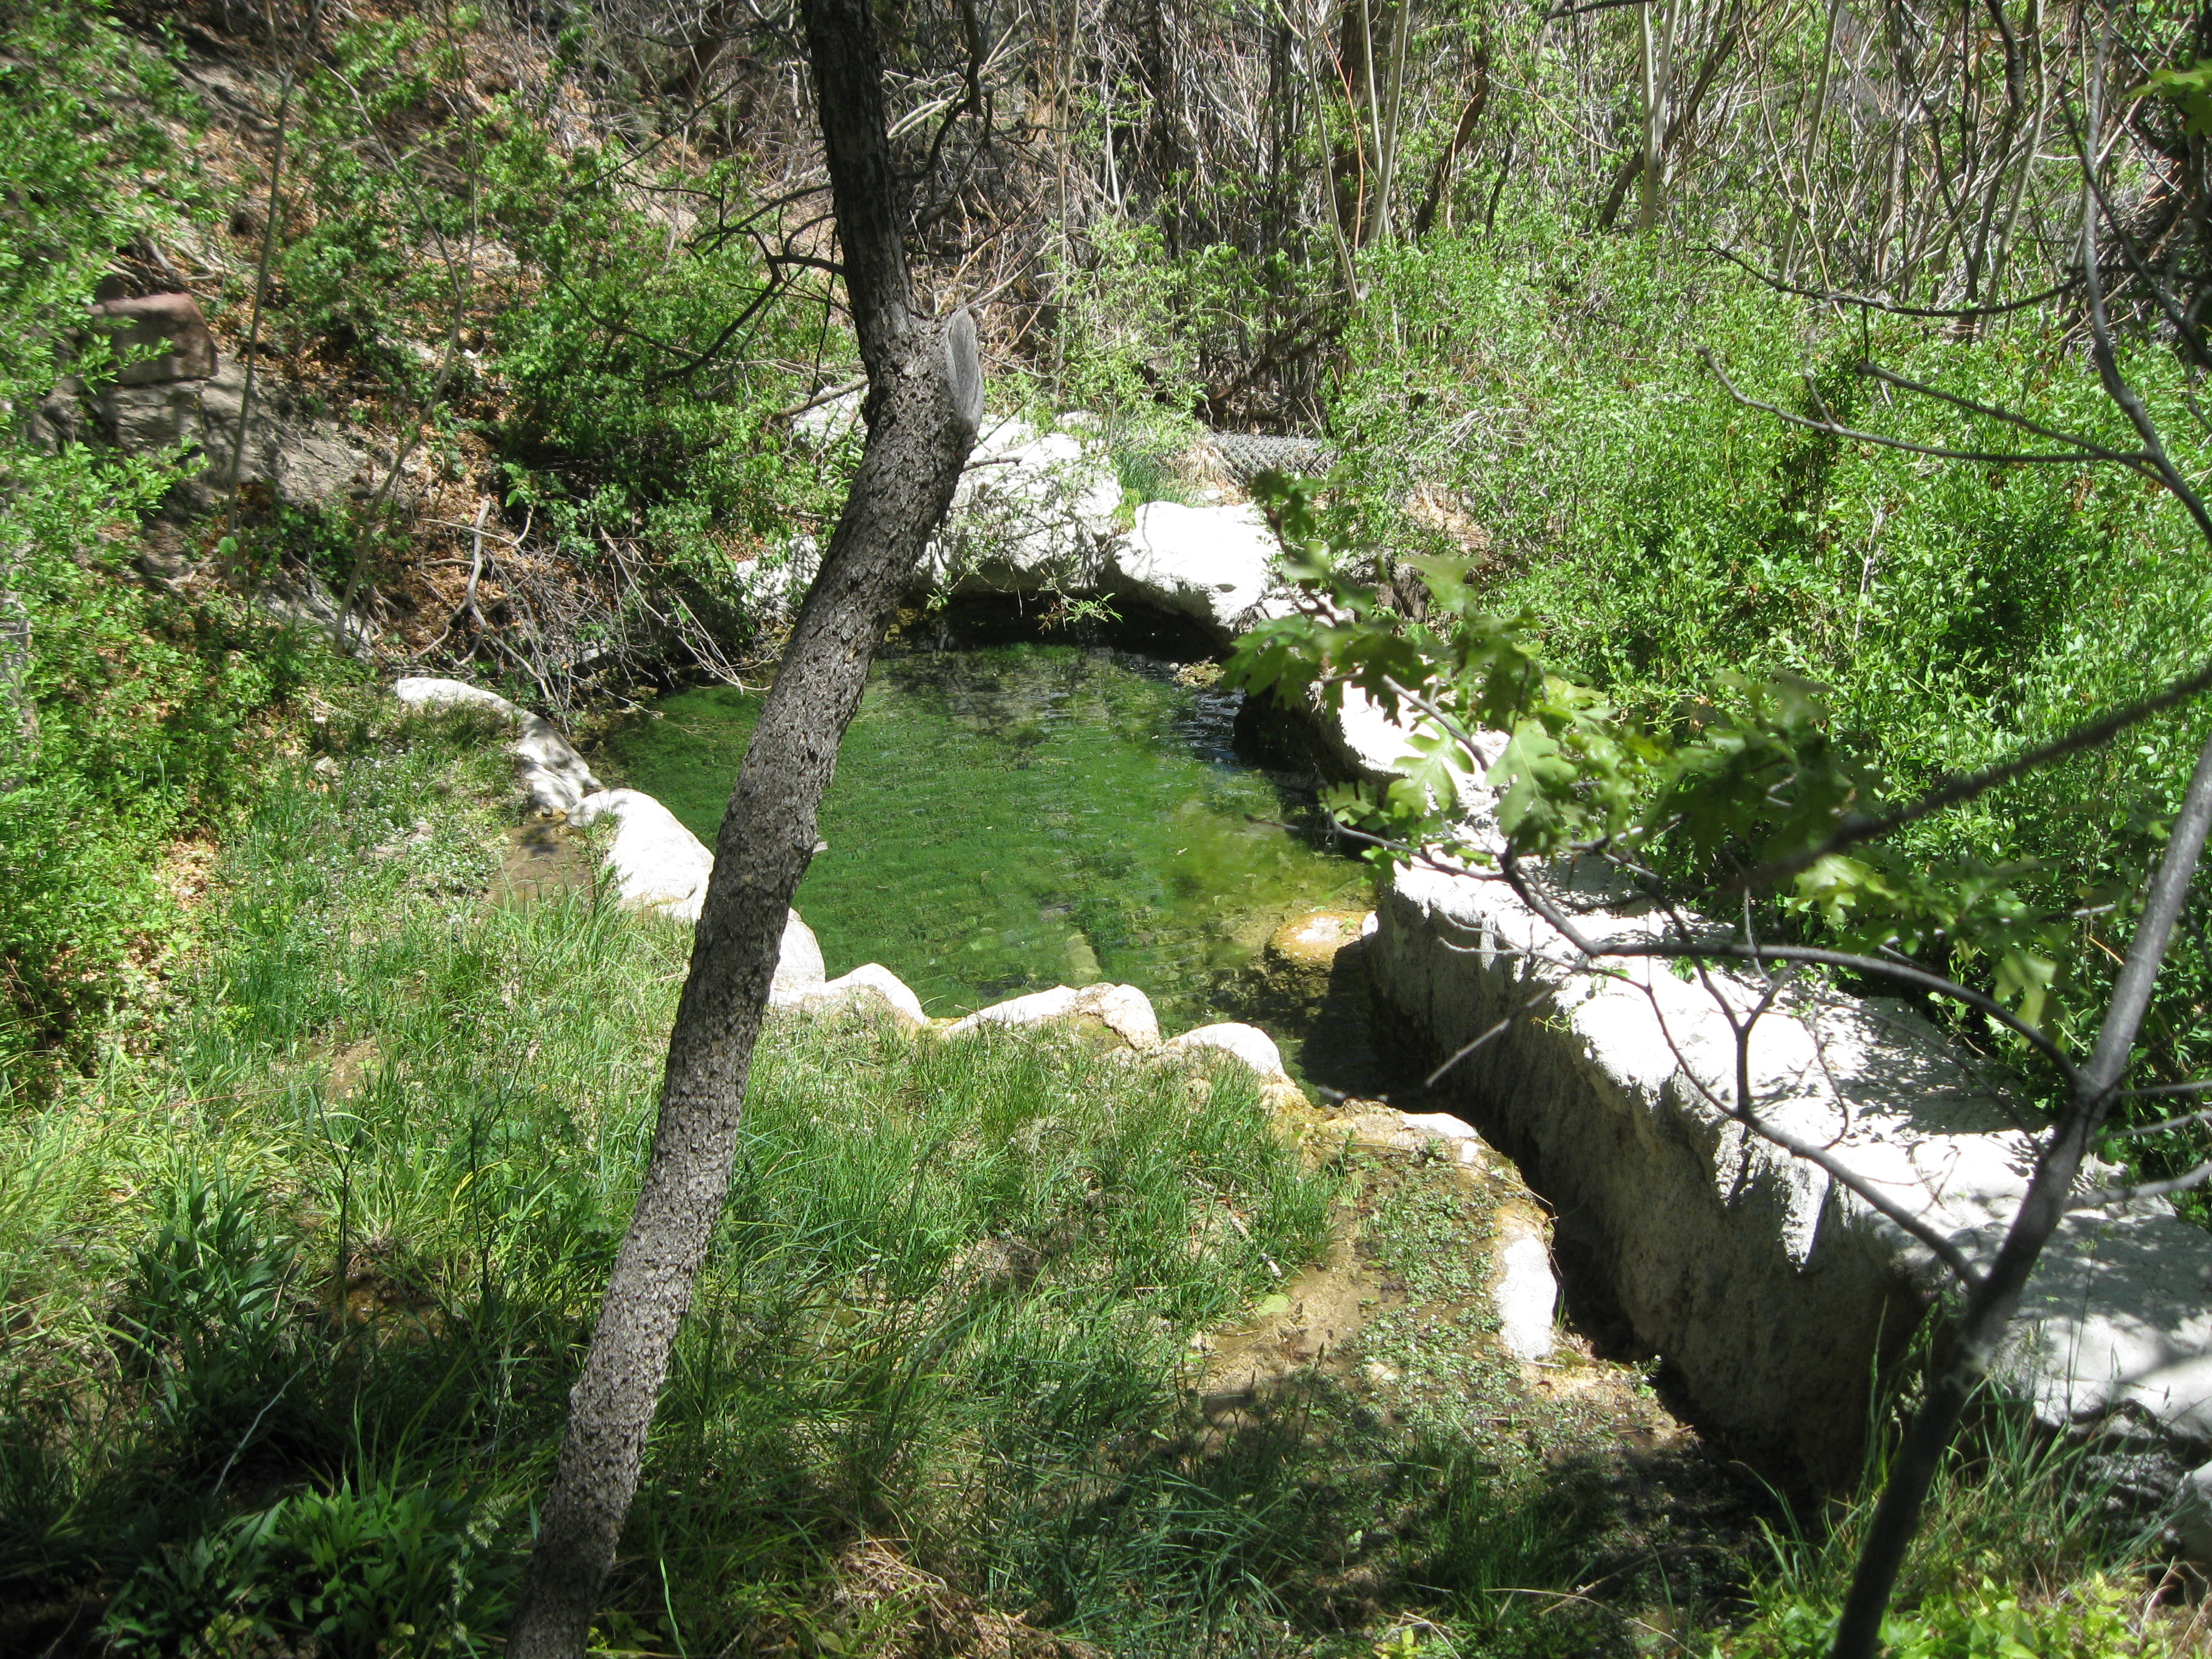 The springs at Carlito Springs